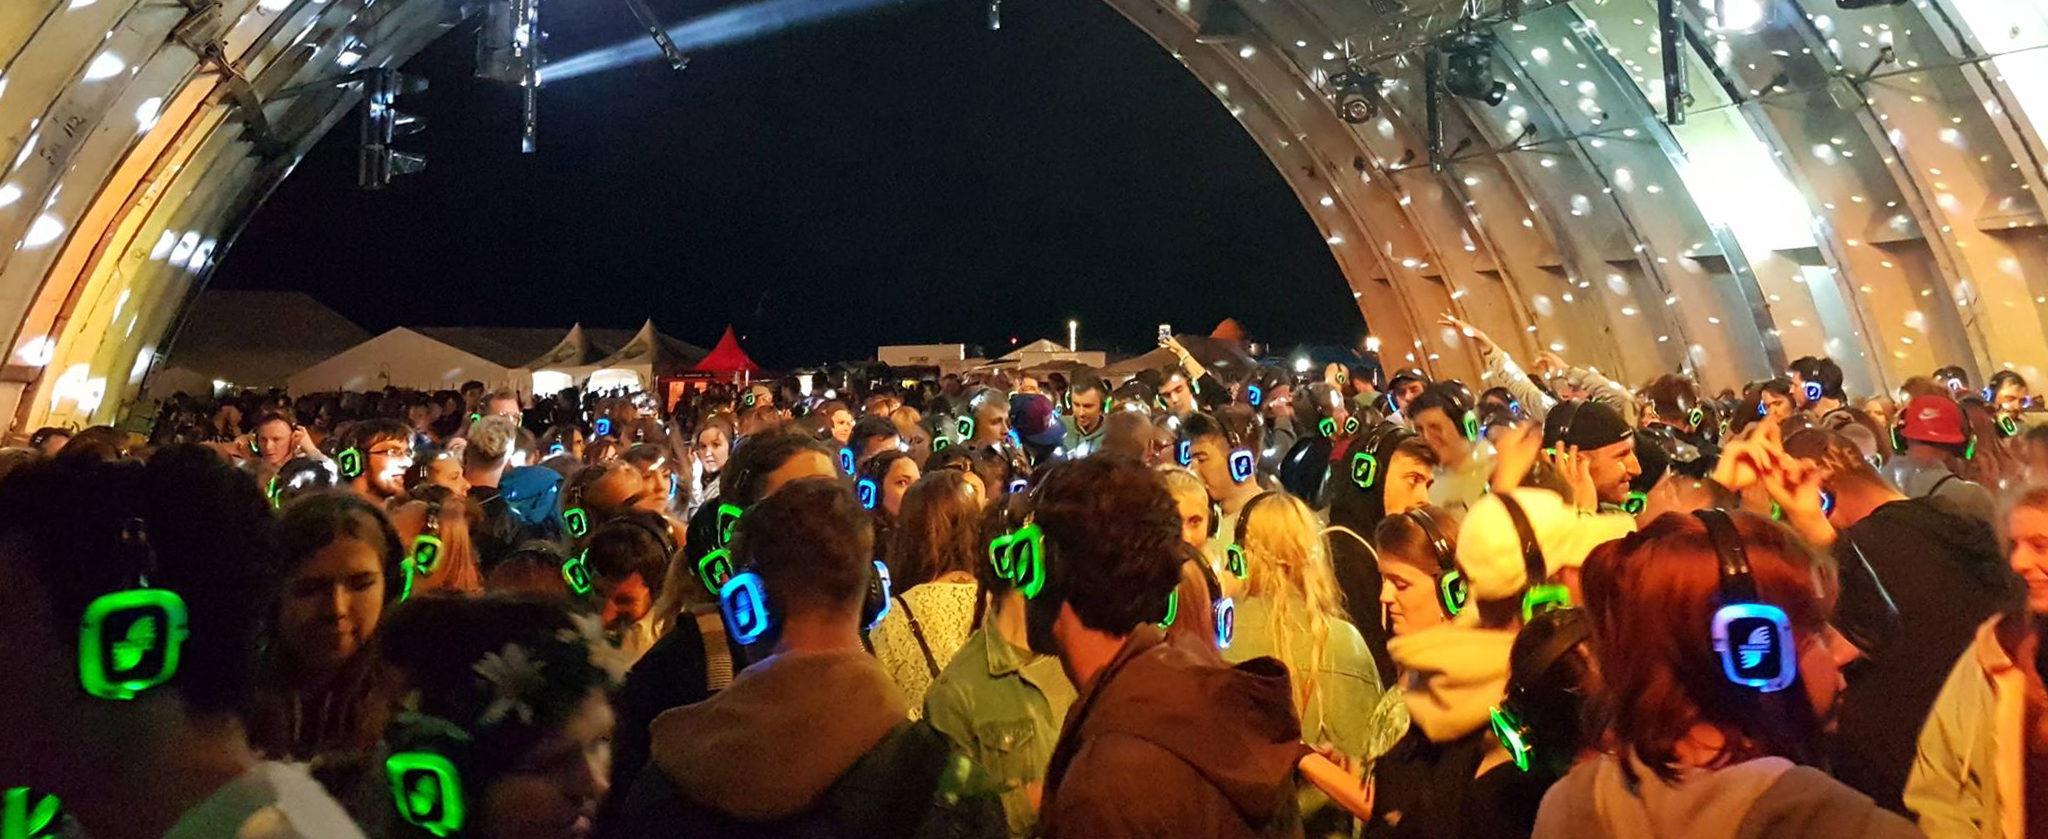 Opener Festival Gdynia Silent Disco